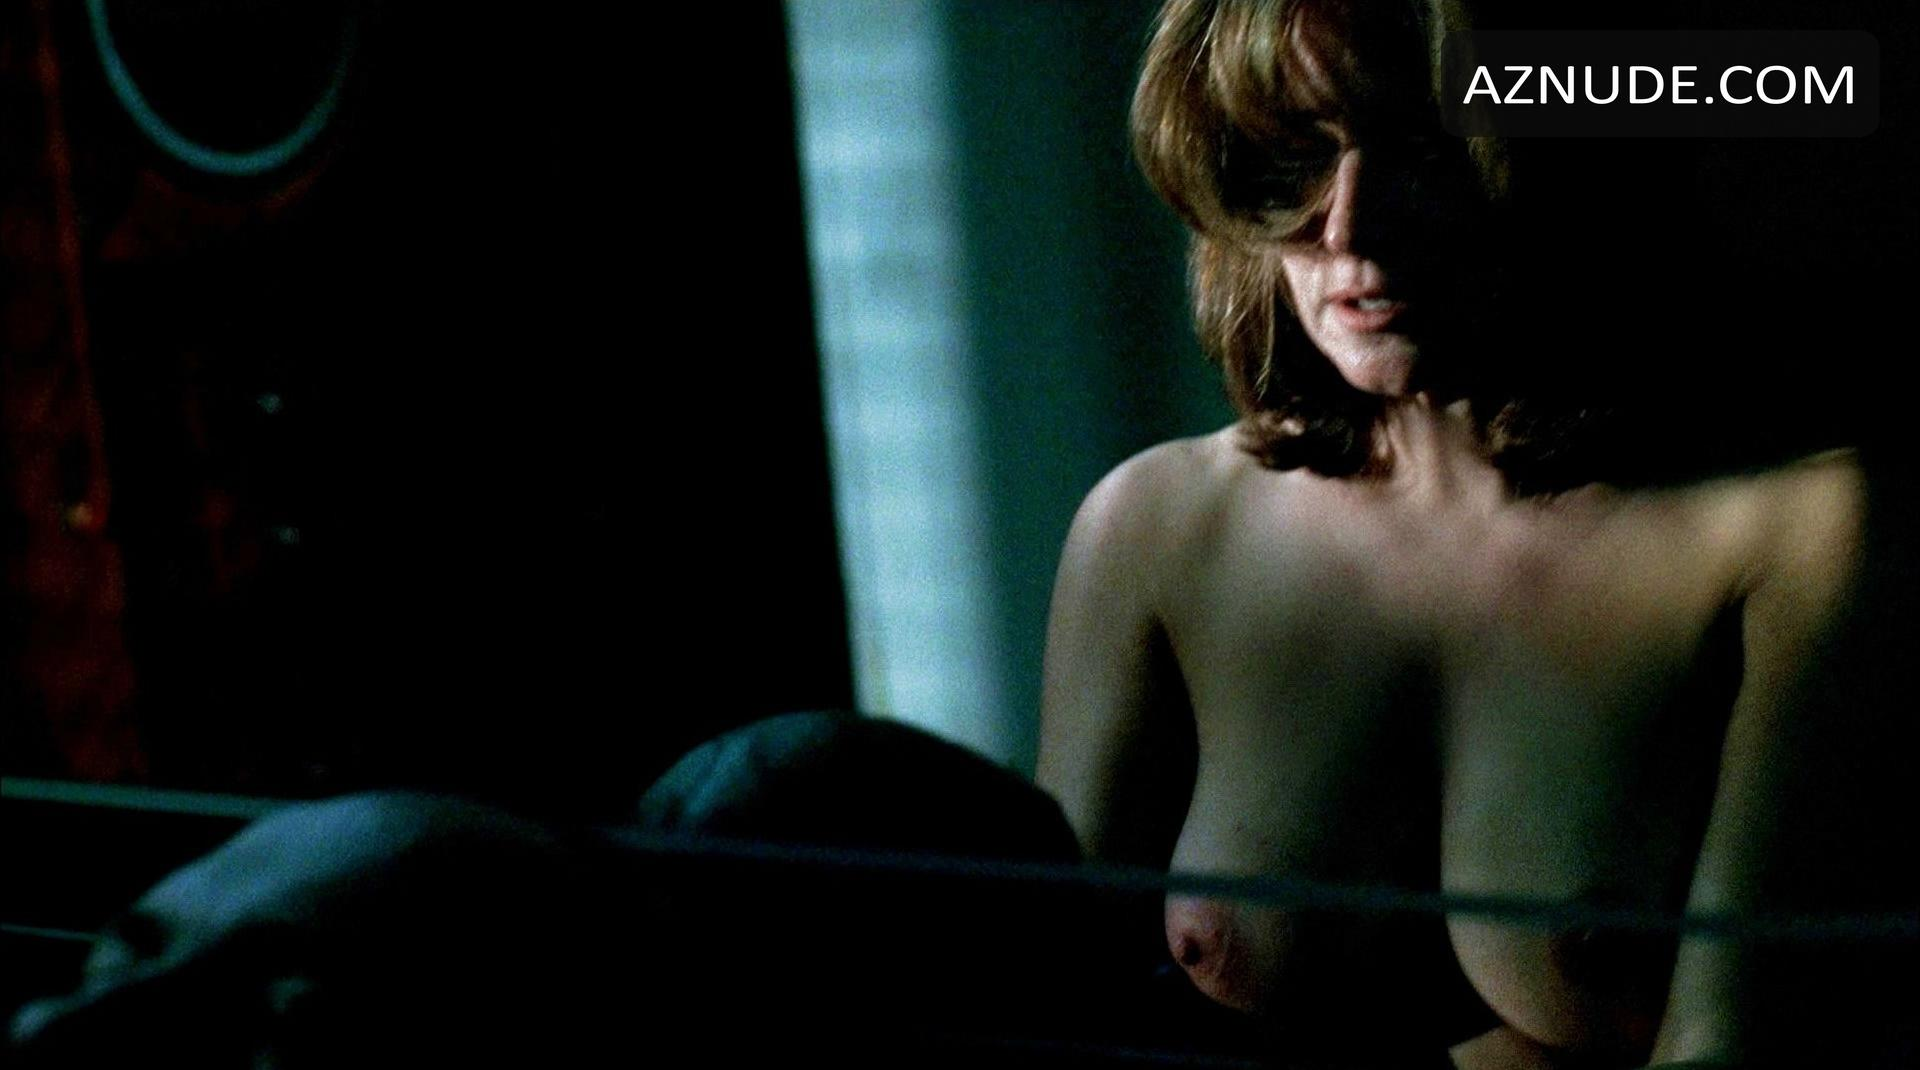 loraine bracco nude pictures